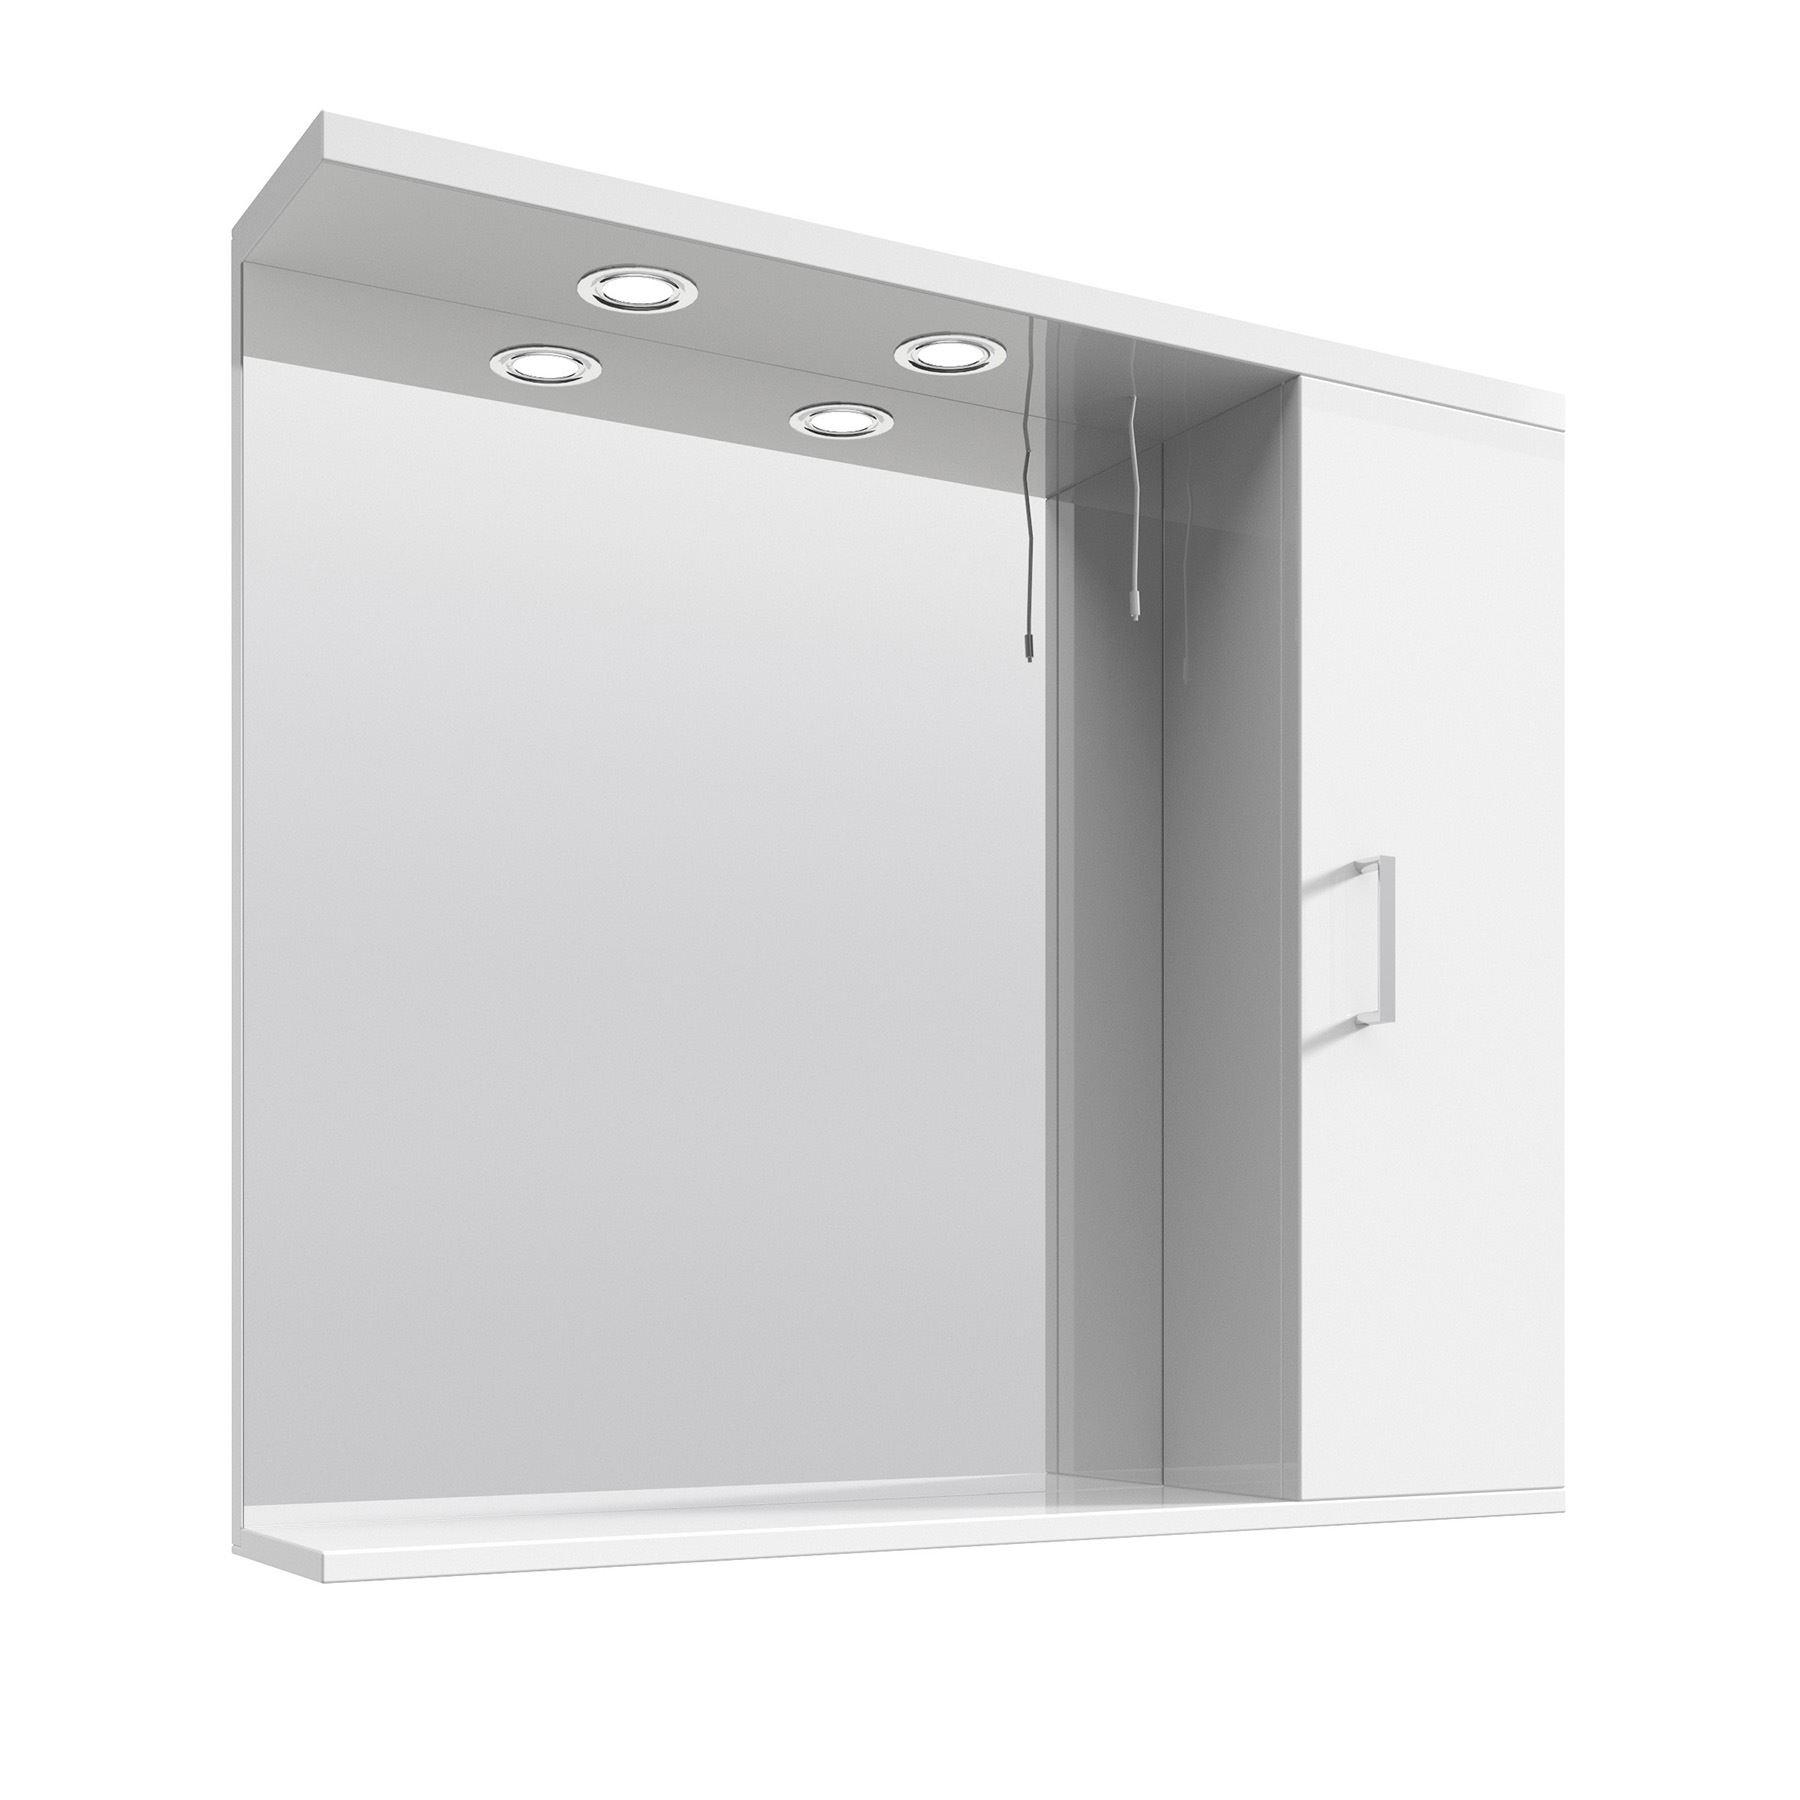 Illuminated high gloss white bathroom mirror vanity - Mirrored bathroom cabinet with lights ...